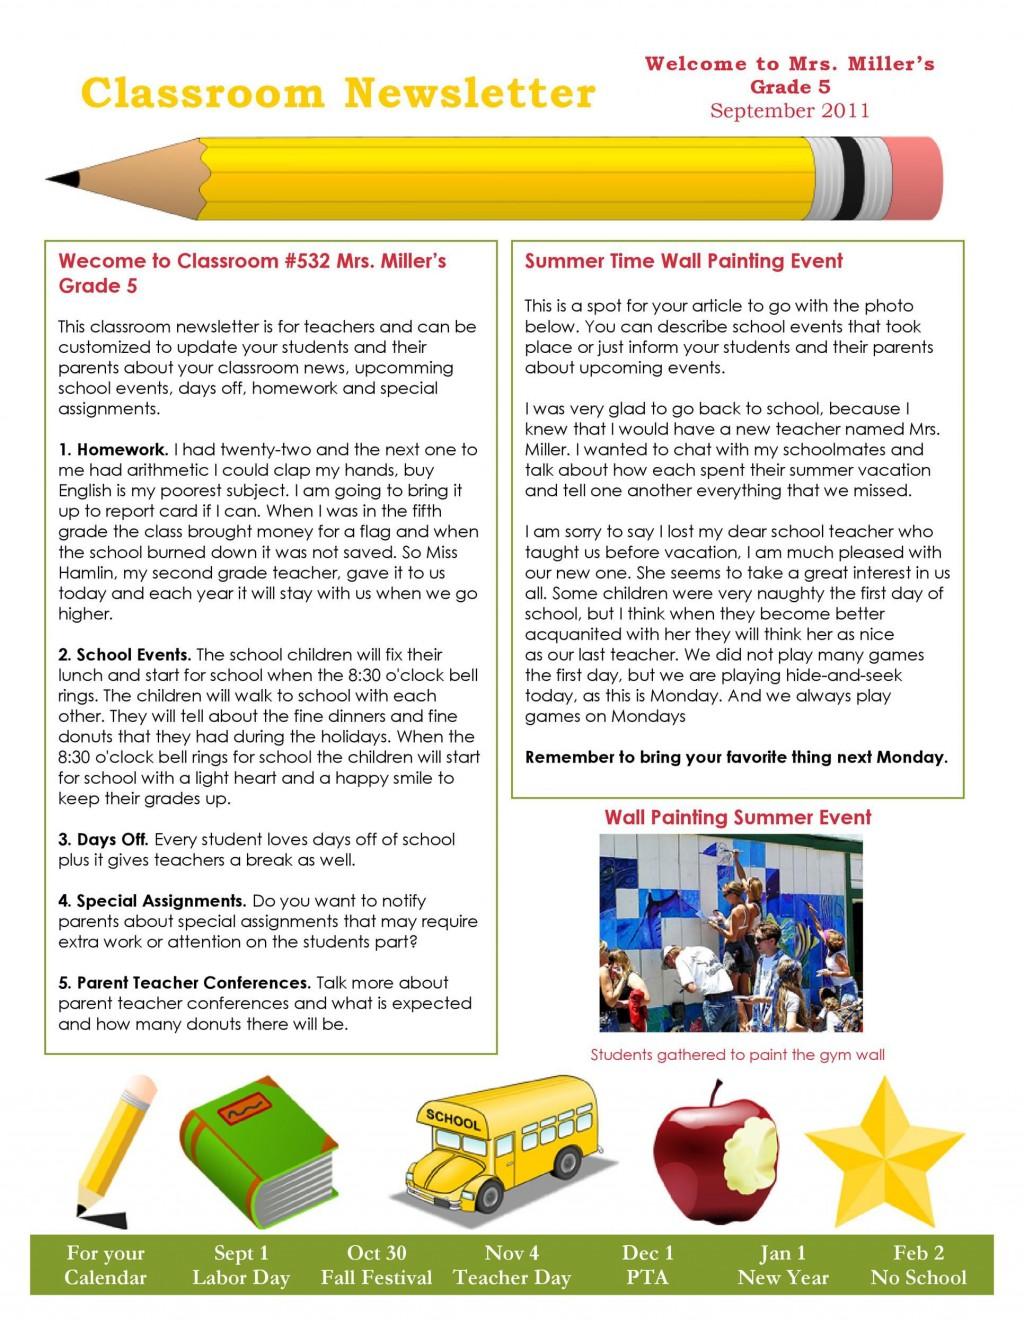 008 Top Elementary School Newsletter Template Concept  Clas Teacher Free CounselorLarge